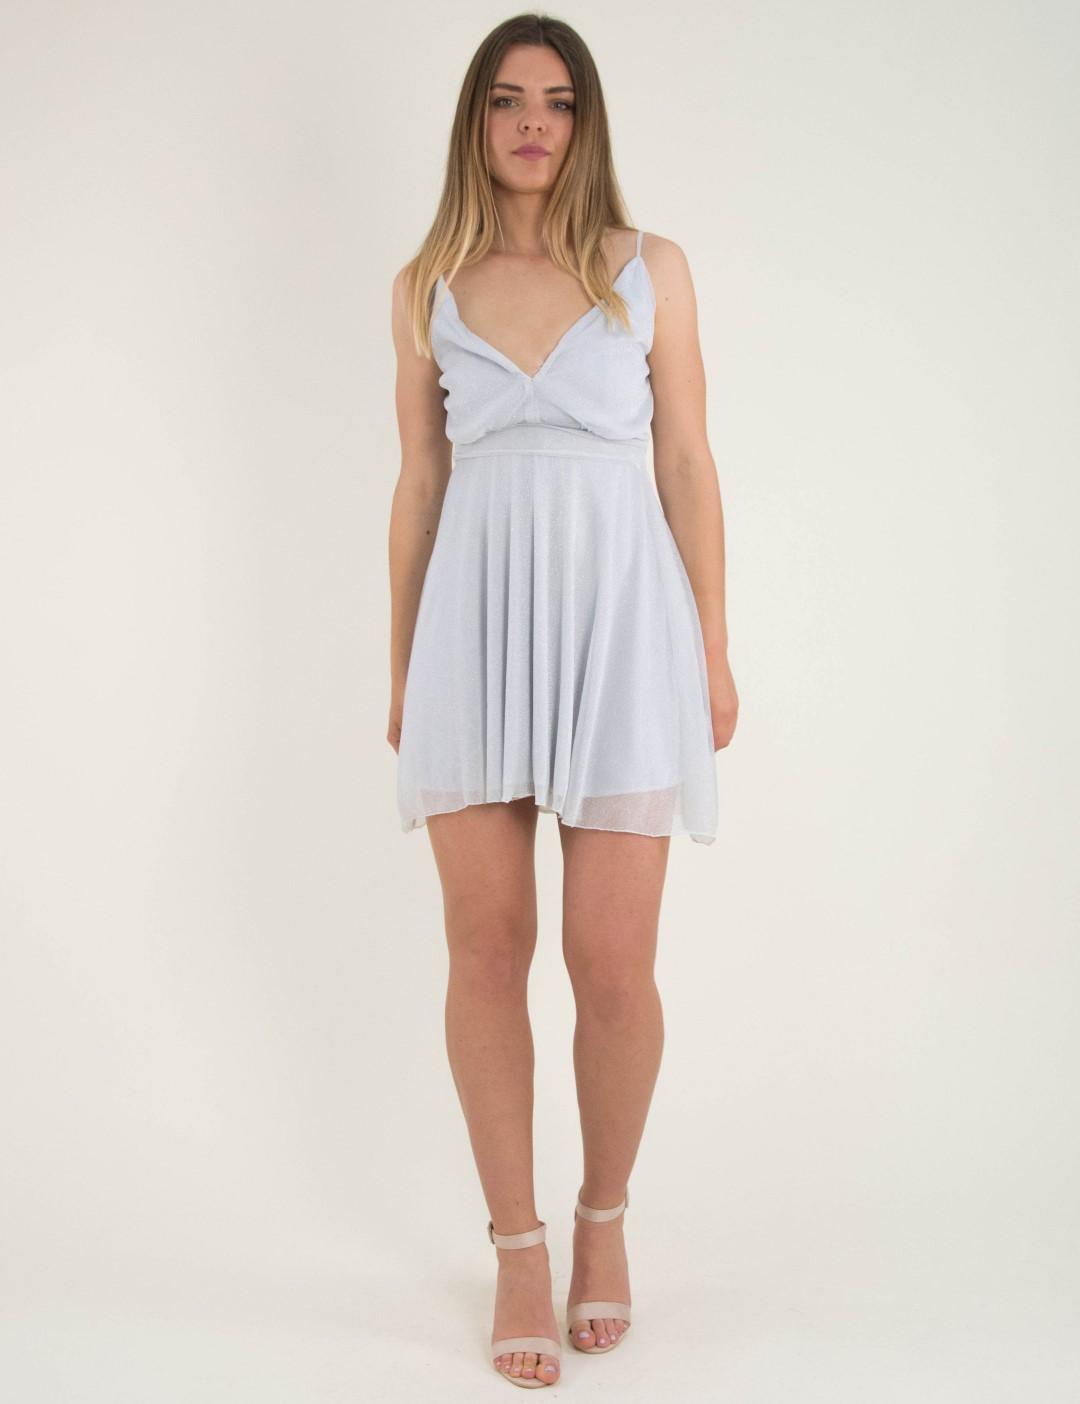 bf972a7eaddc Γυναικείο γκρι κλος φόρεμα Lurex τούλι No Stress 8580228D